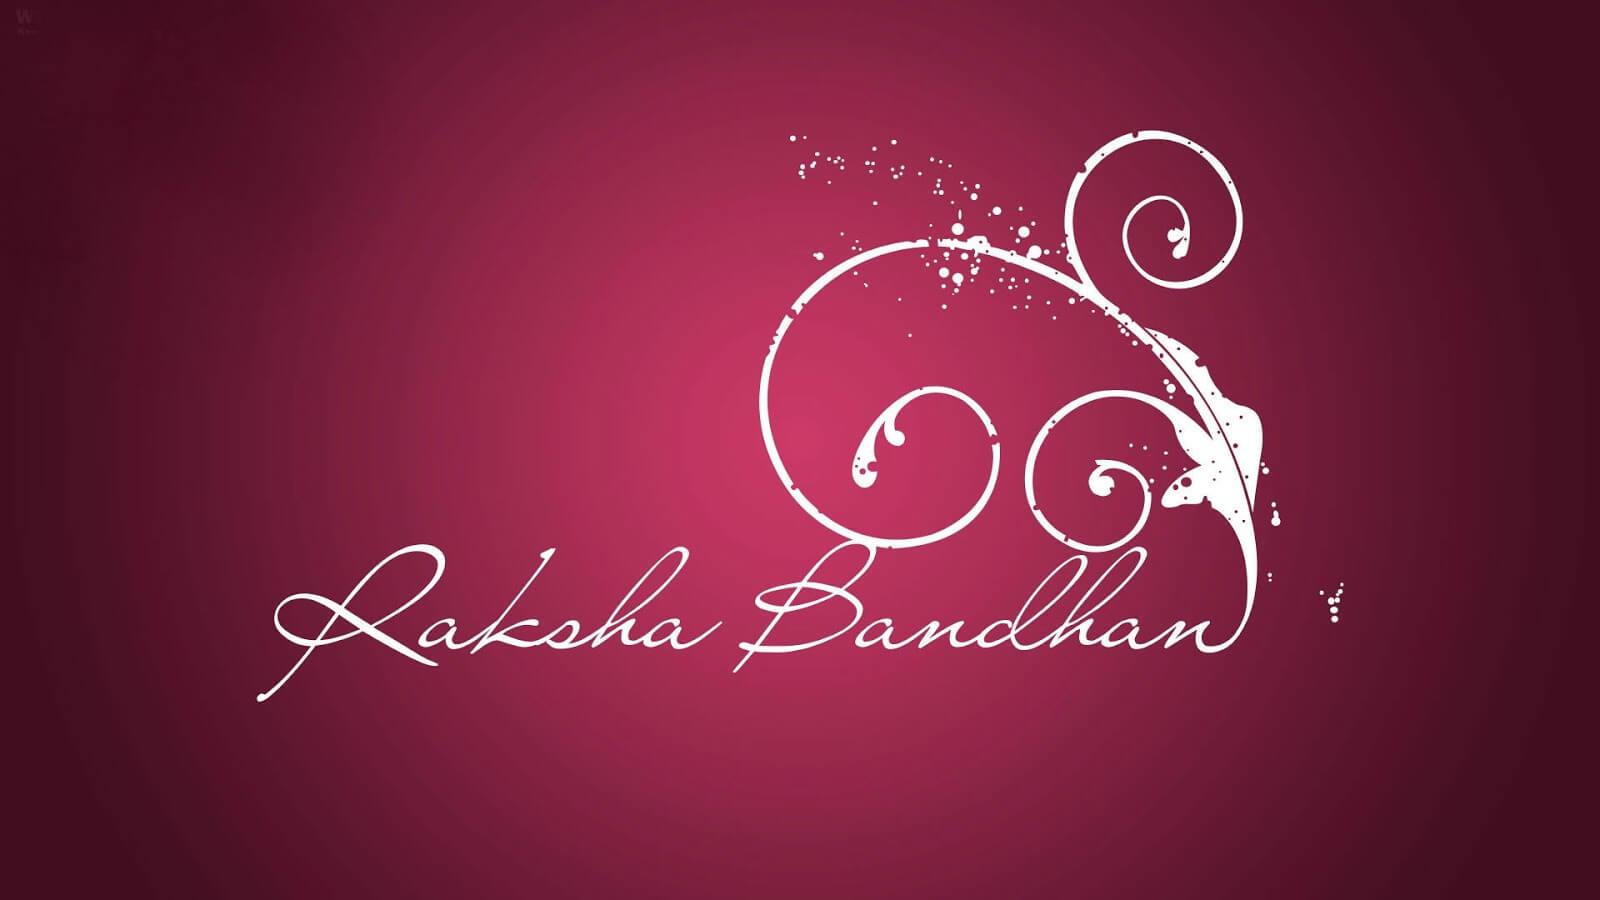 happy Raksha Bandhan images wallpapers greeting cards